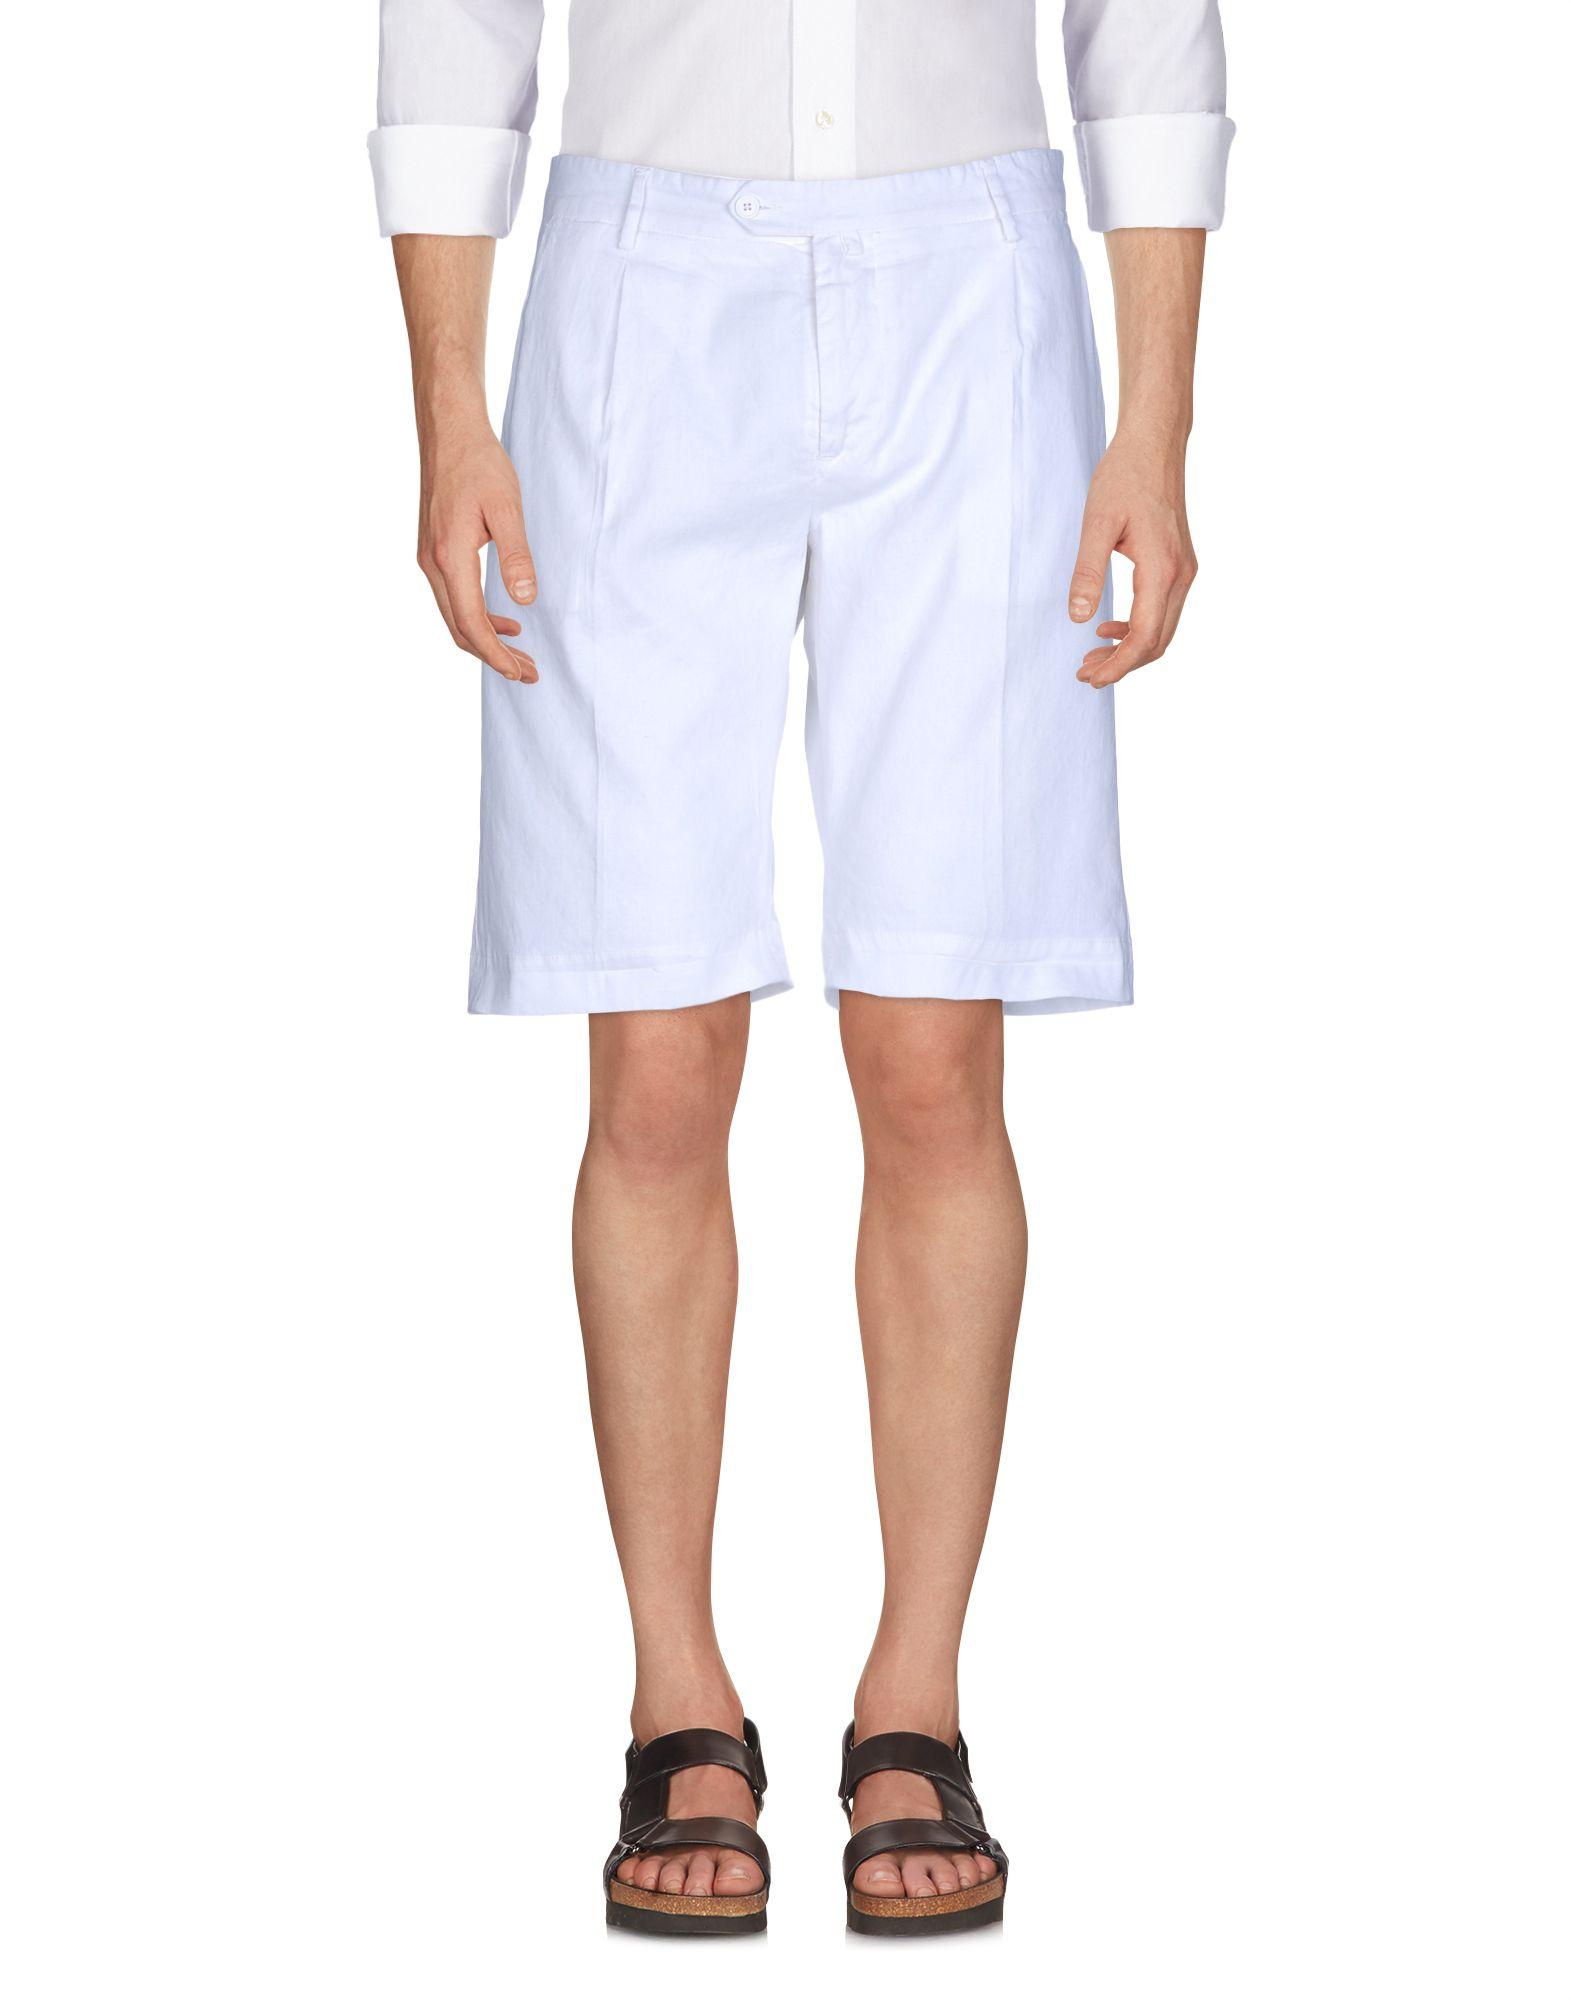 Pantalone Classico Classico Pantalone Maxi Ho Uomo - 13101371DW f76161